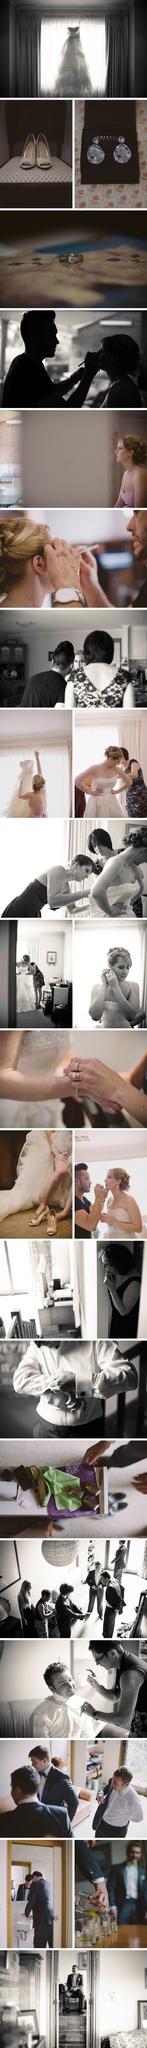 Canberra Boat House Wedding Photos